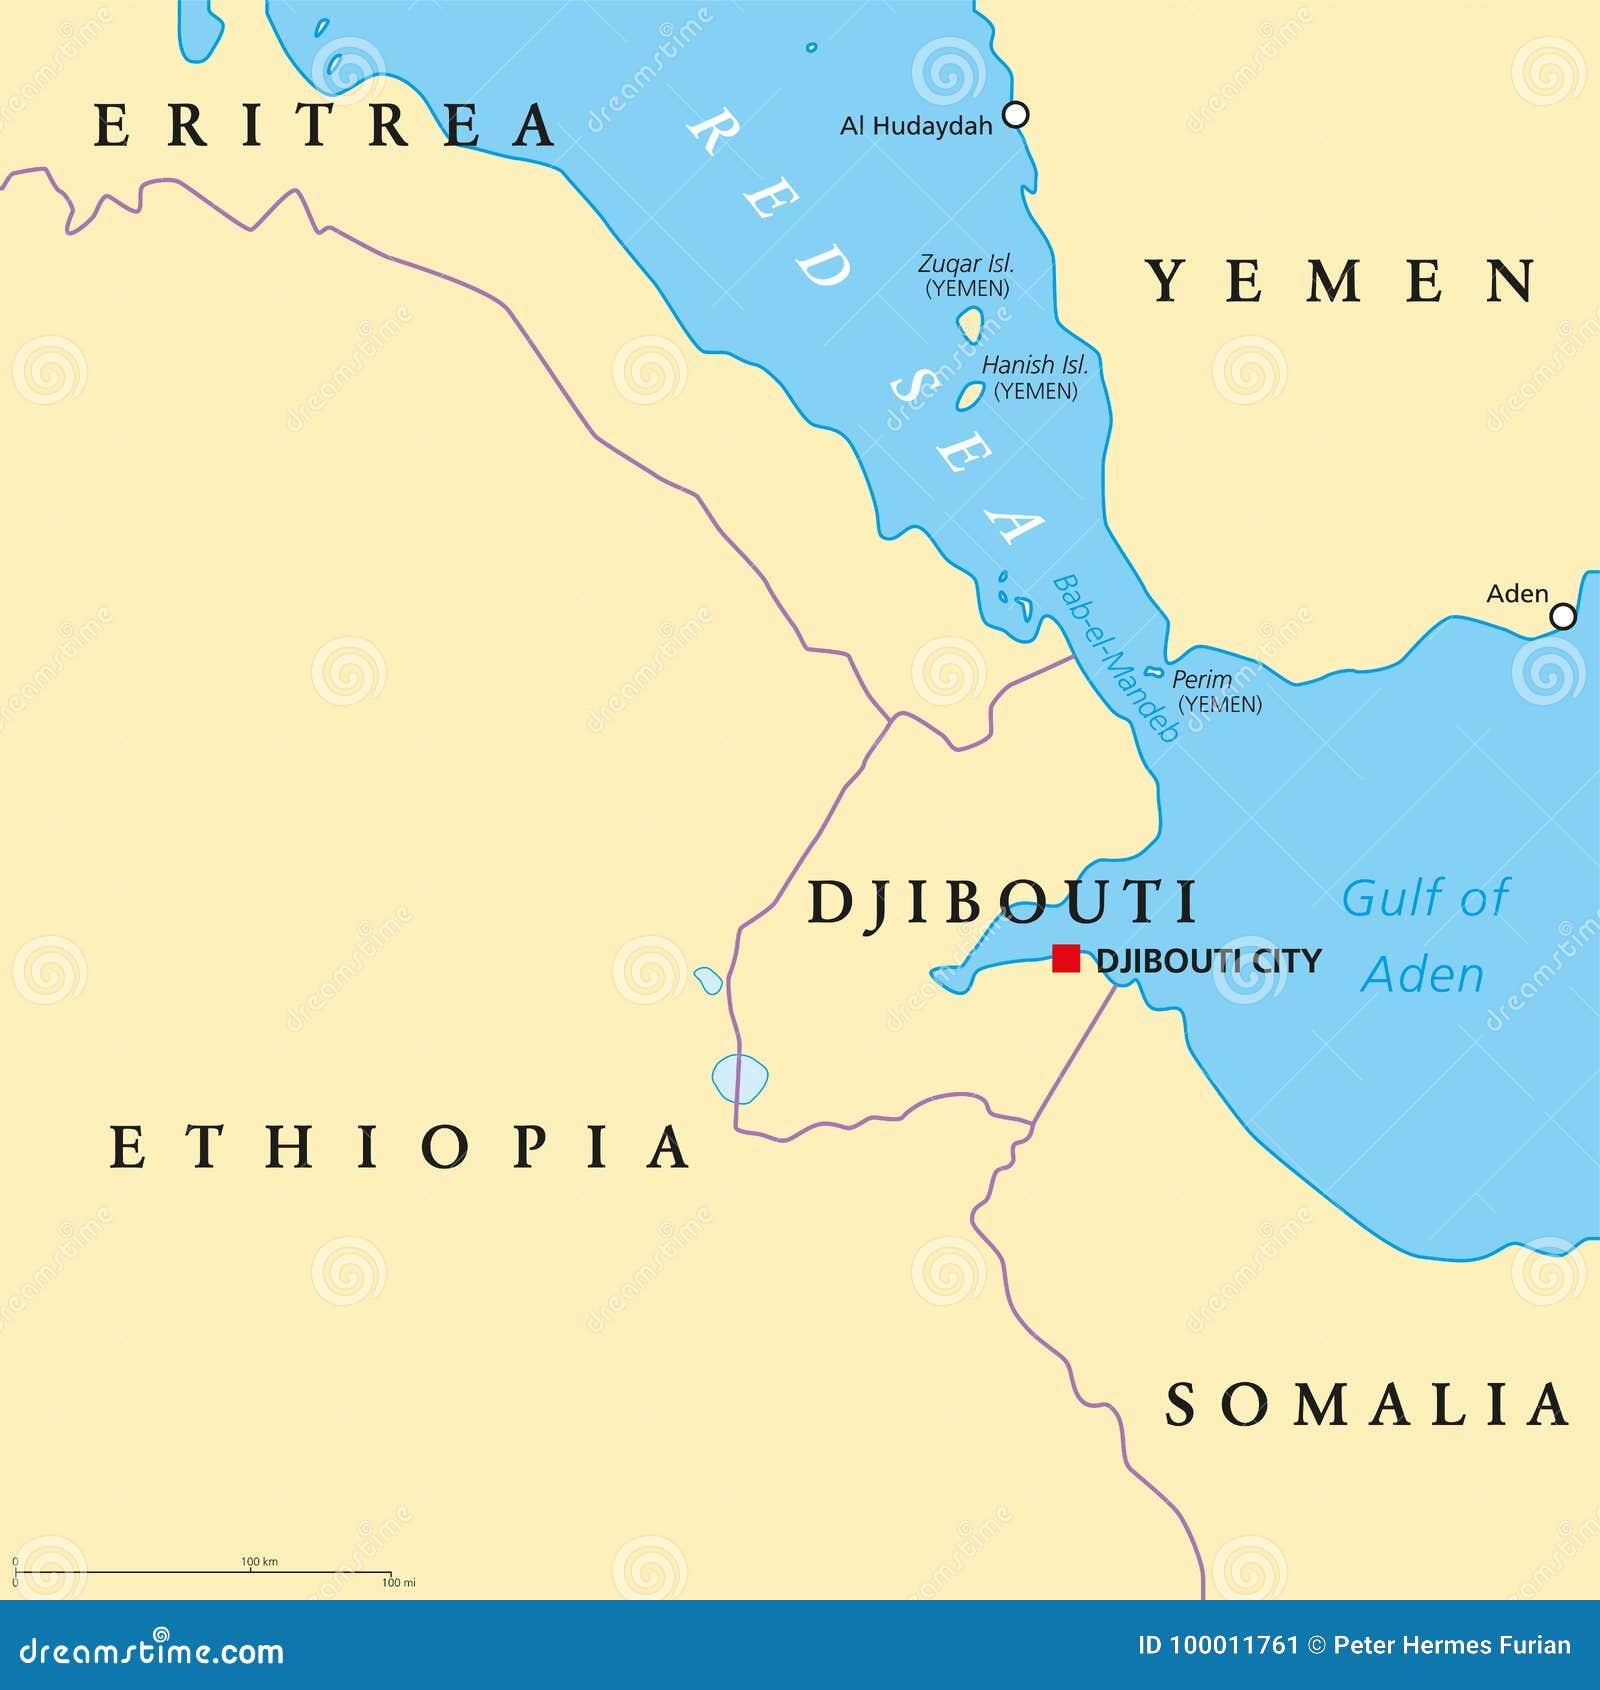 Political Map Of Yemen.Bab El Mandeb Strait Political Map Stock Vector Illustration Of